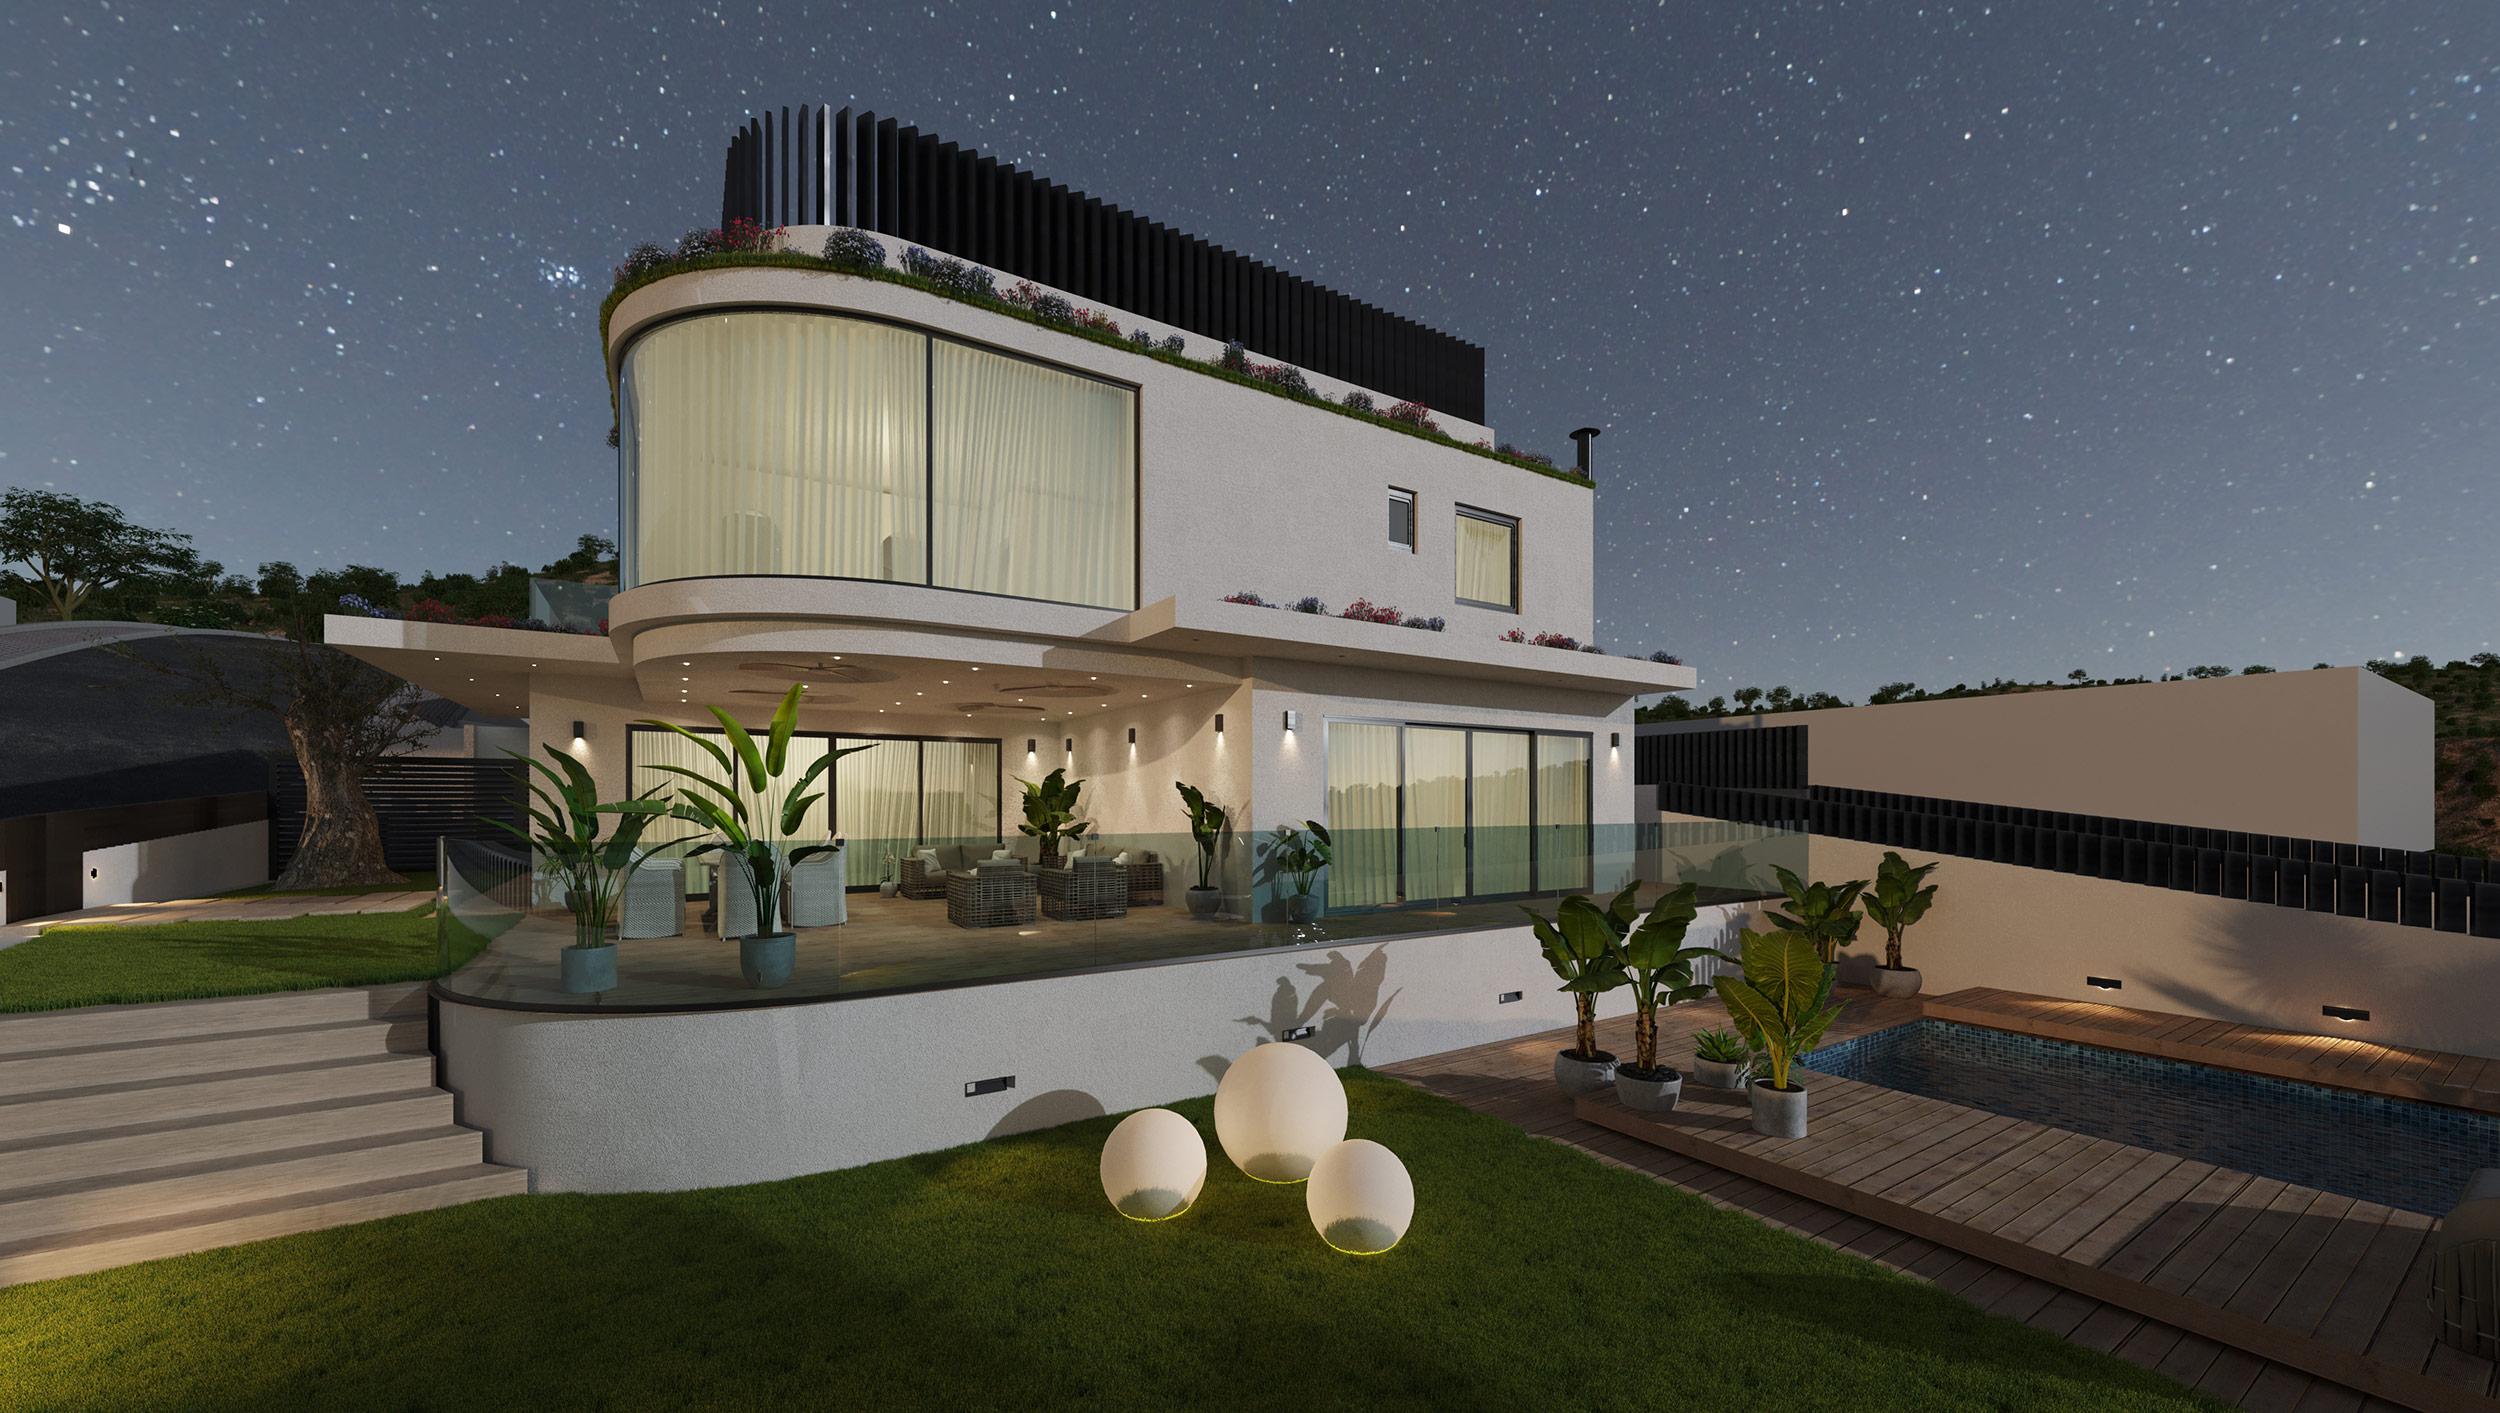 https://www.atelierzoz.com/wp-content/uploads/2020/12/atelierzoz-meadowview-villa-9.jpg